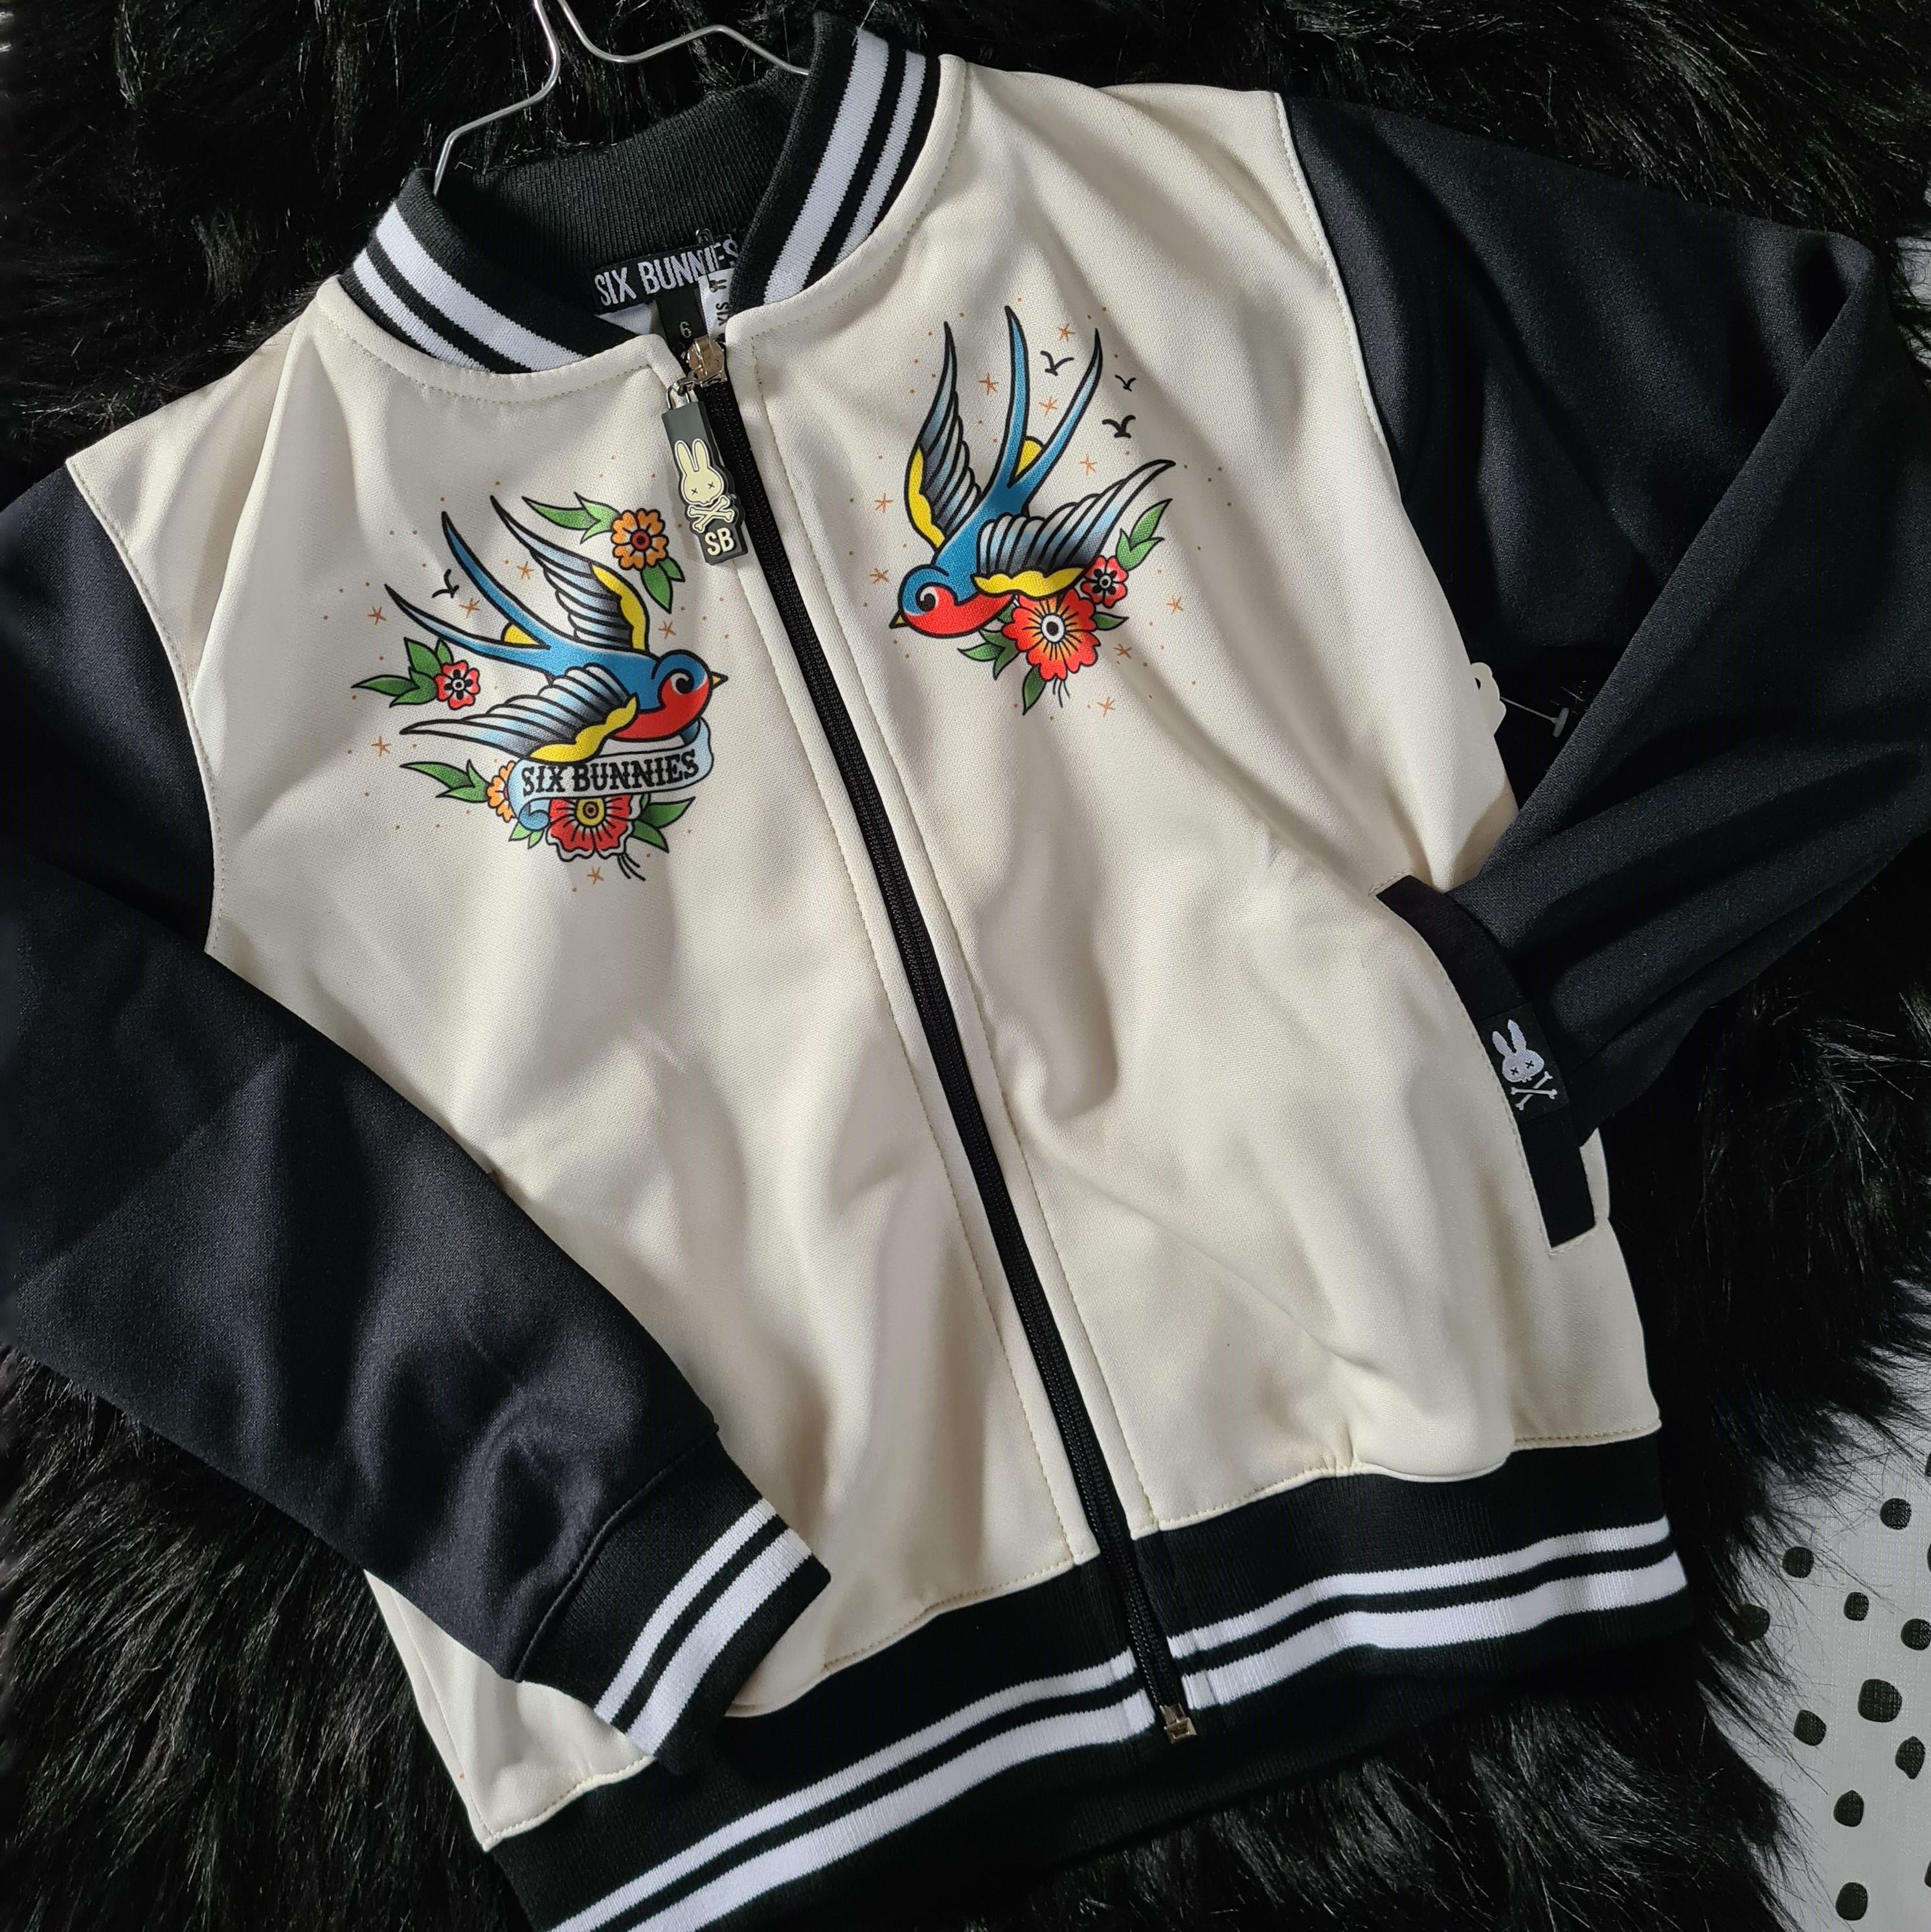 Six Bunnie Old School Jacket Front